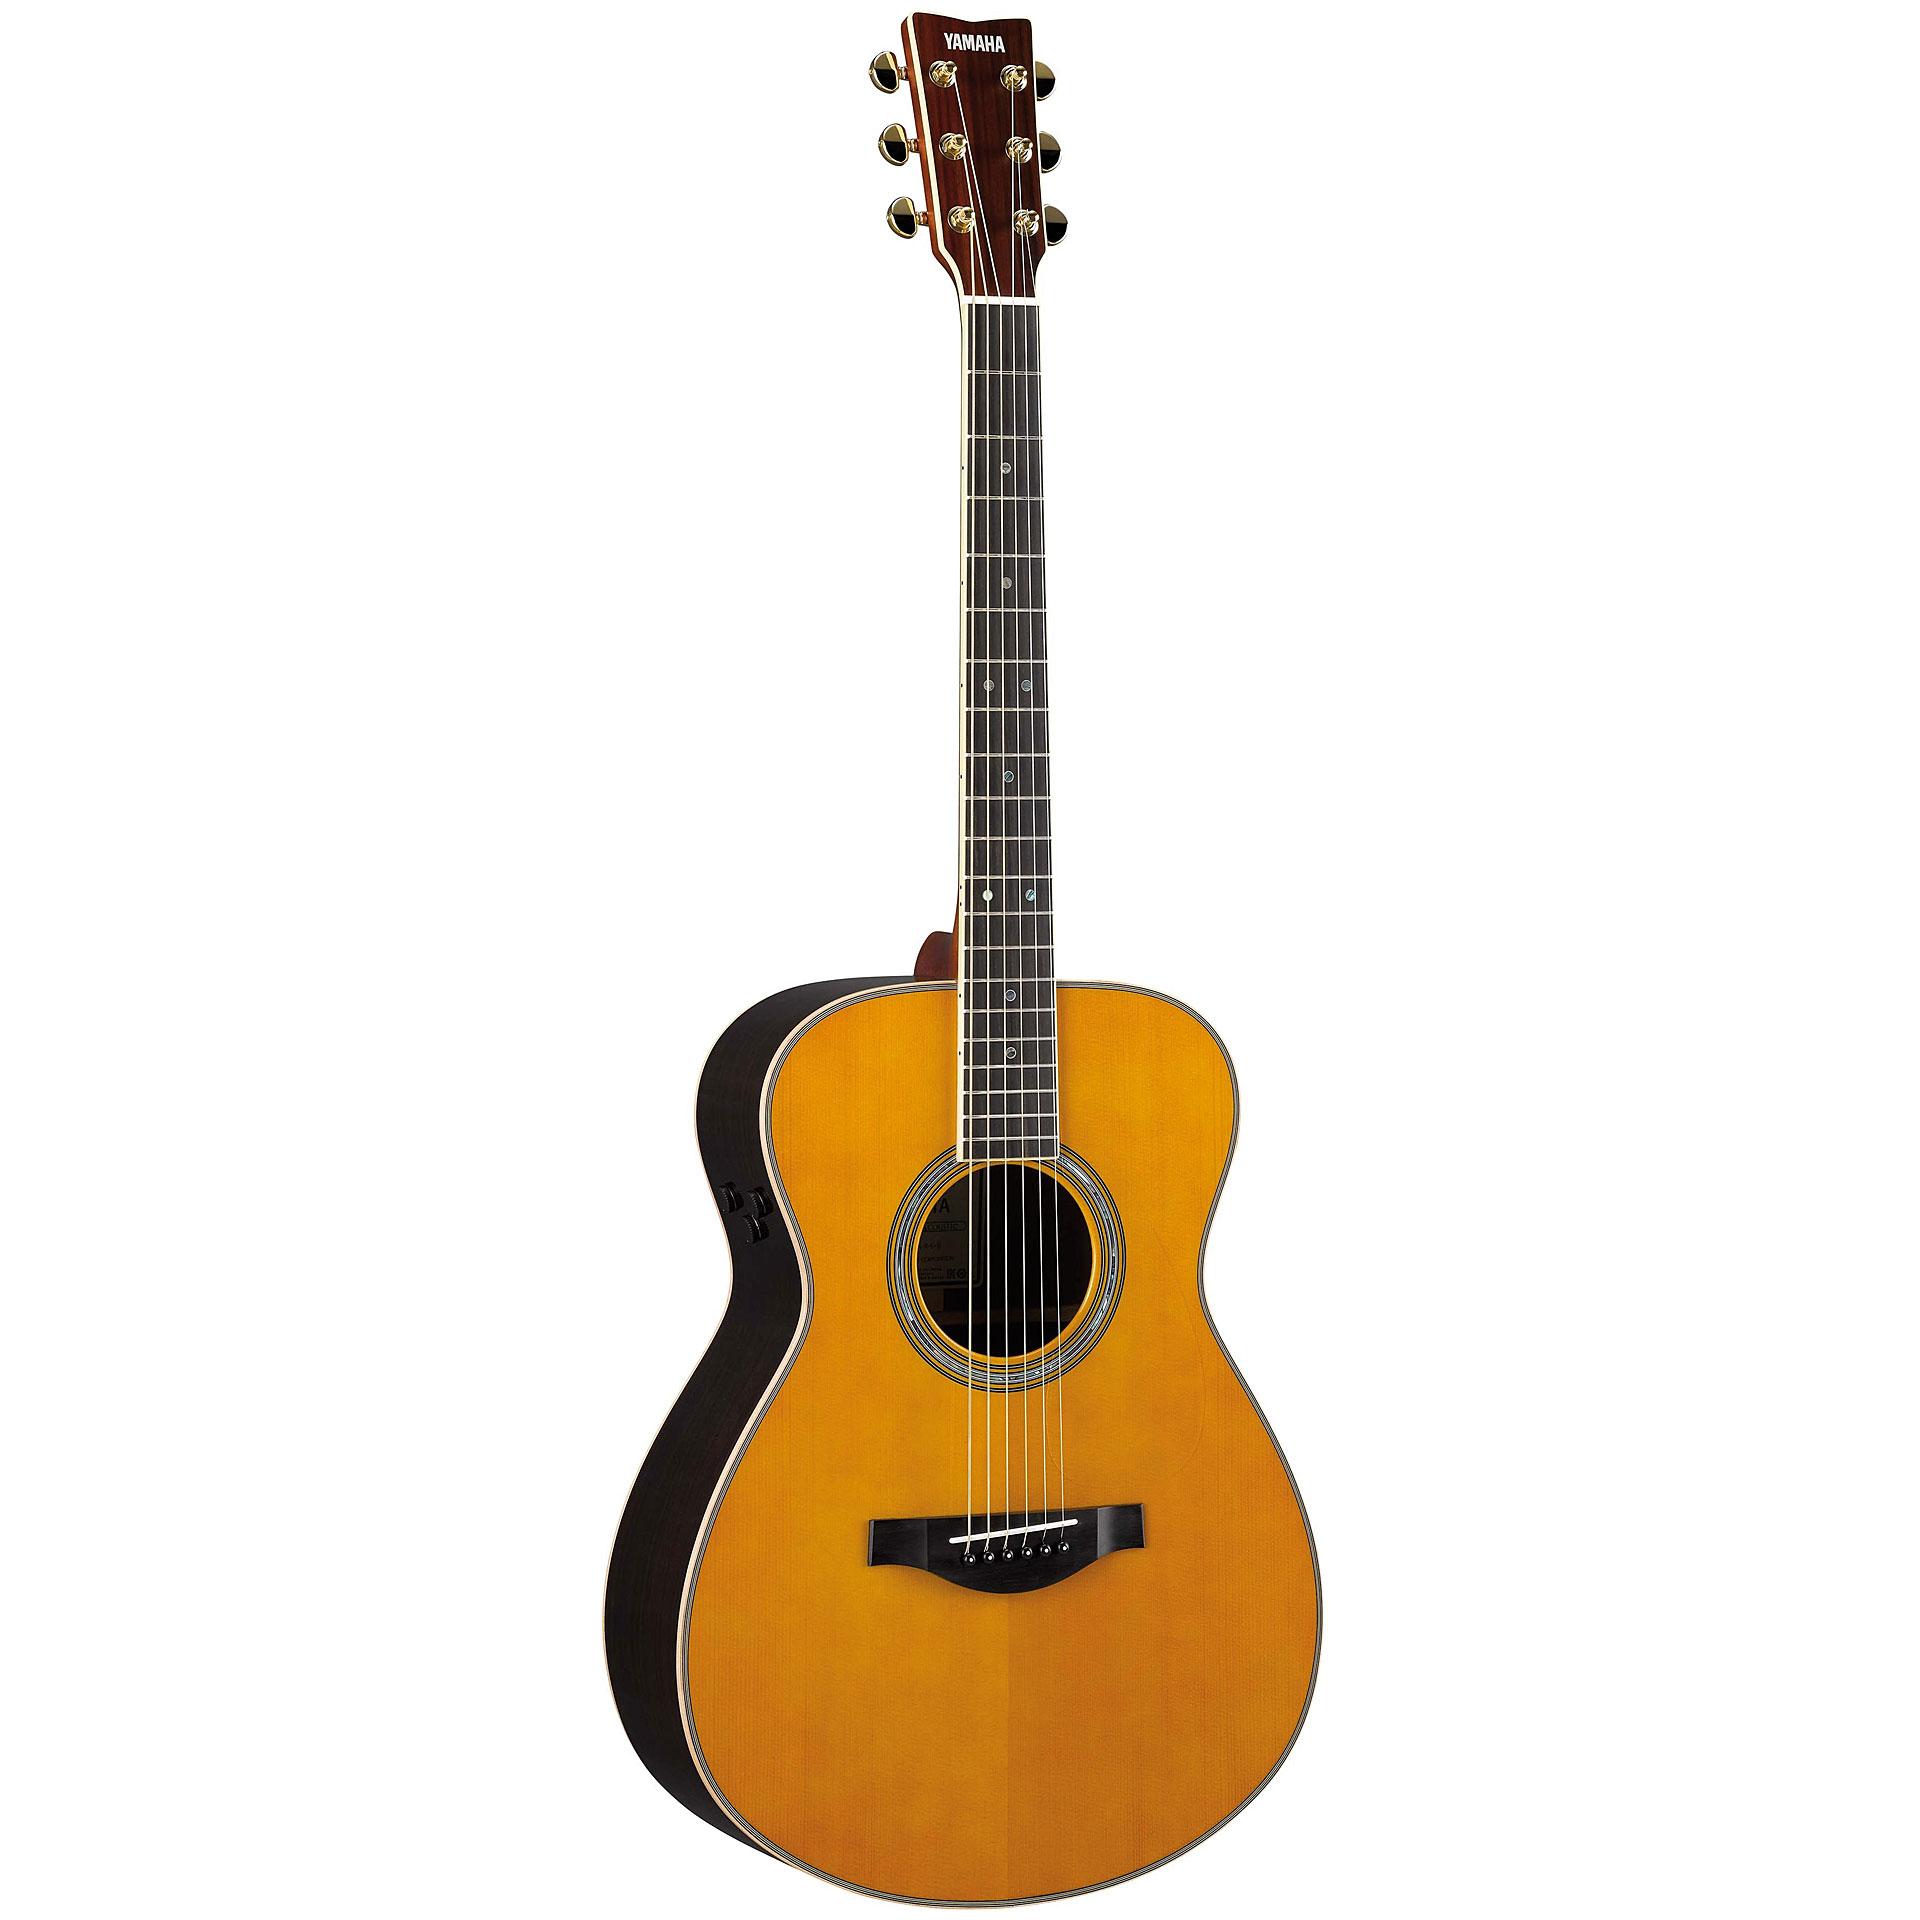 yamaha ls ta guitare acoustique. Black Bedroom Furniture Sets. Home Design Ideas